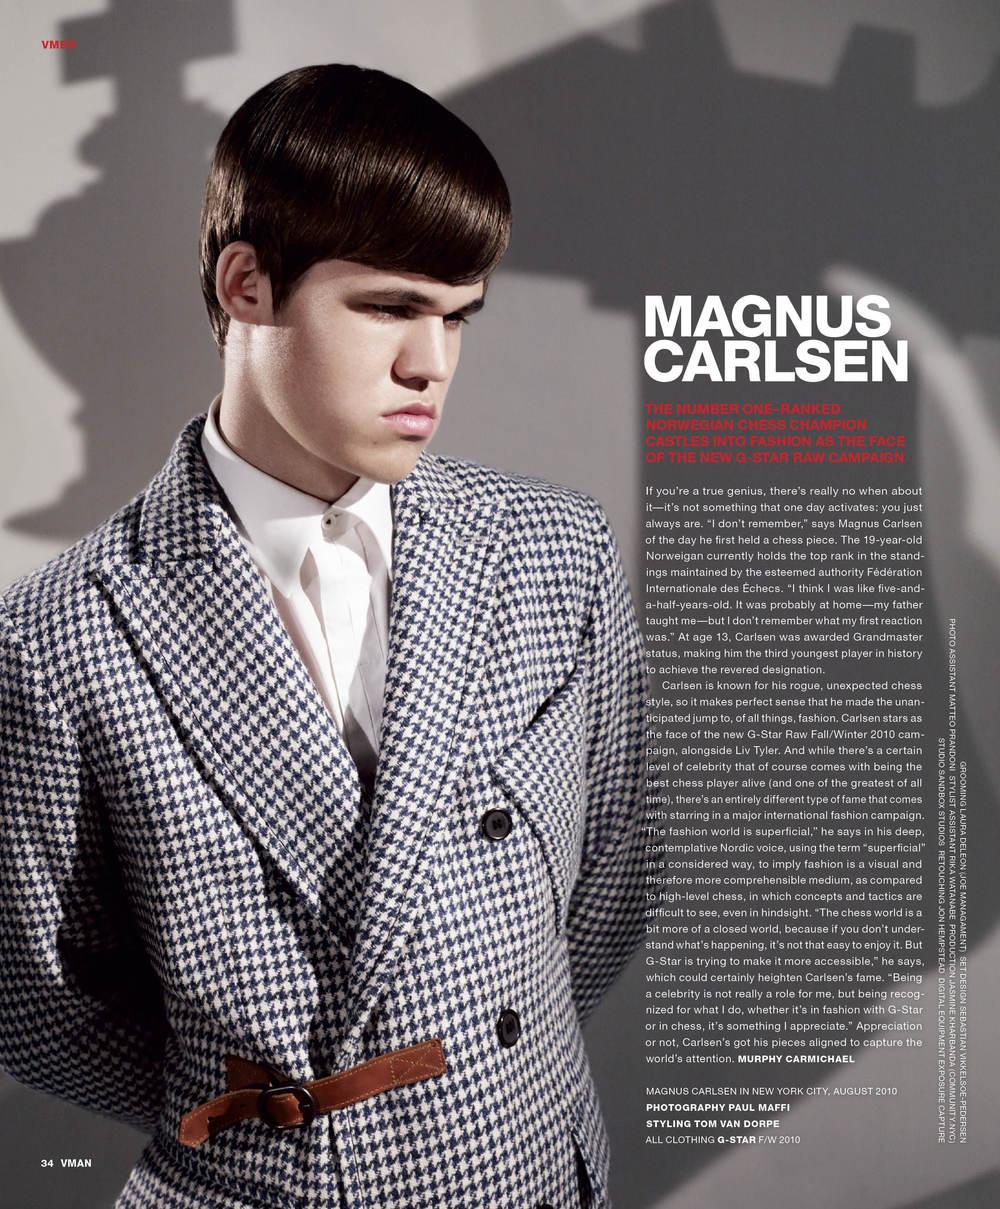 Magnus carlsen elliott w david